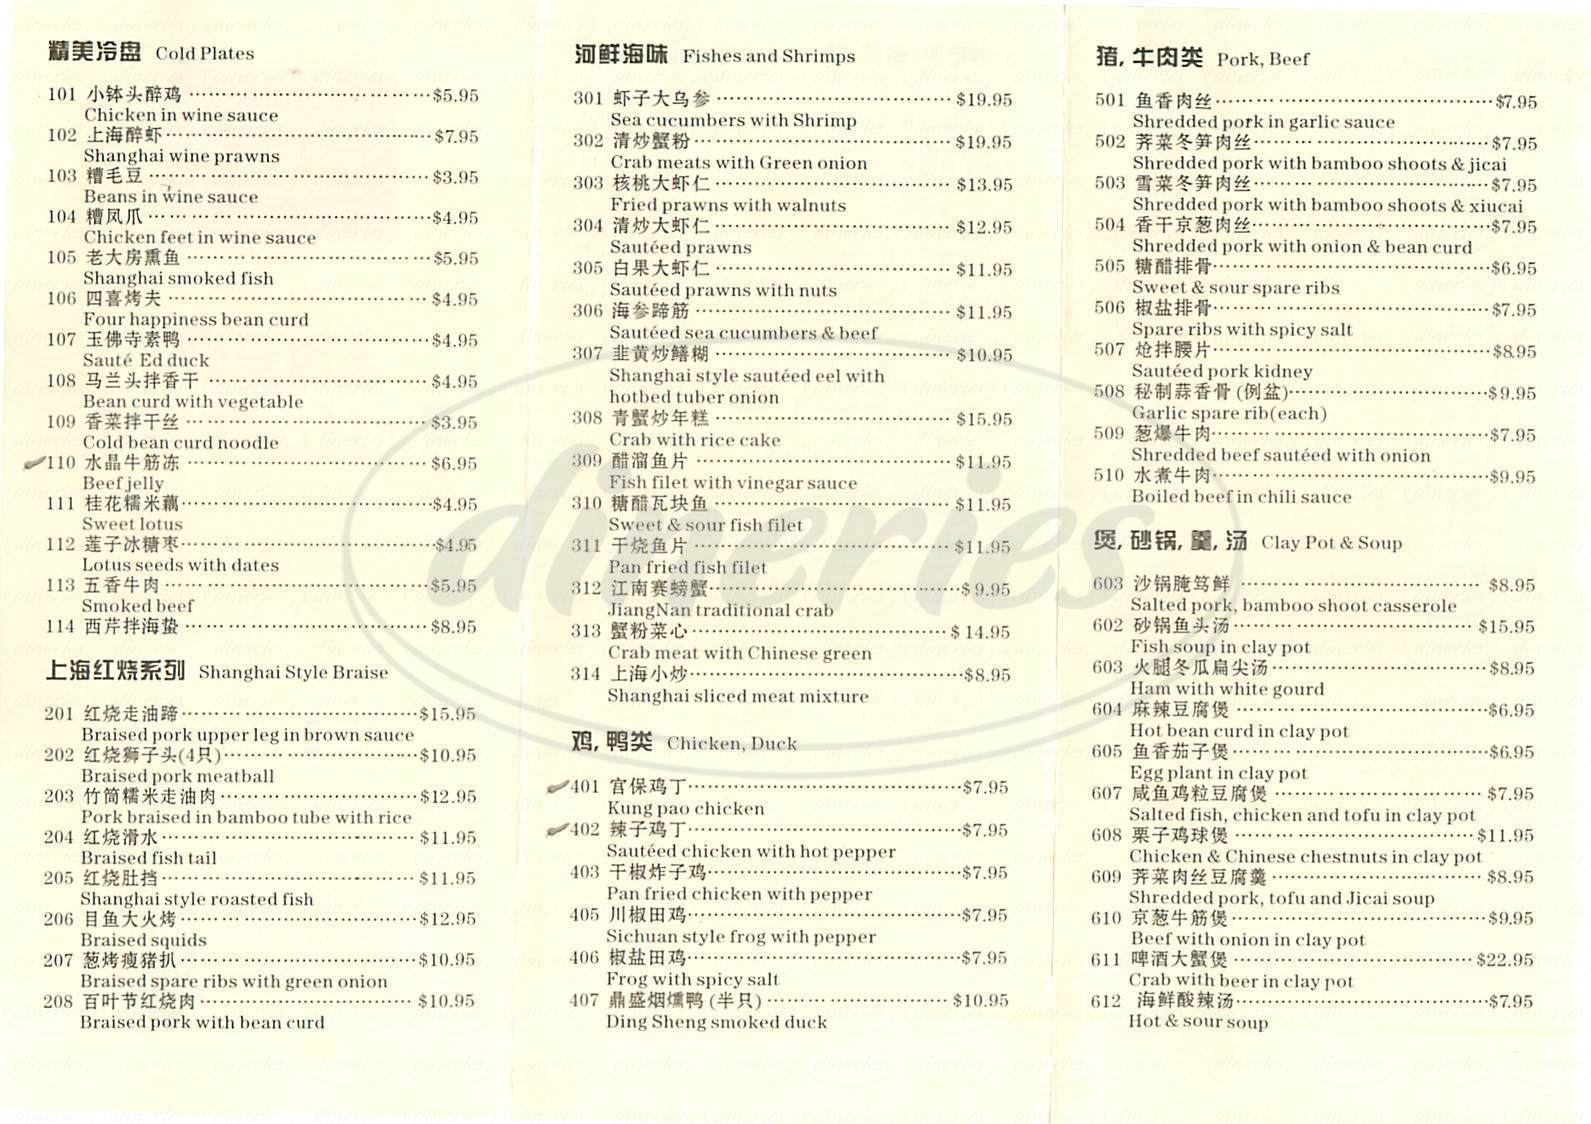 menu for Shanghai Ding Sheng Restaurant